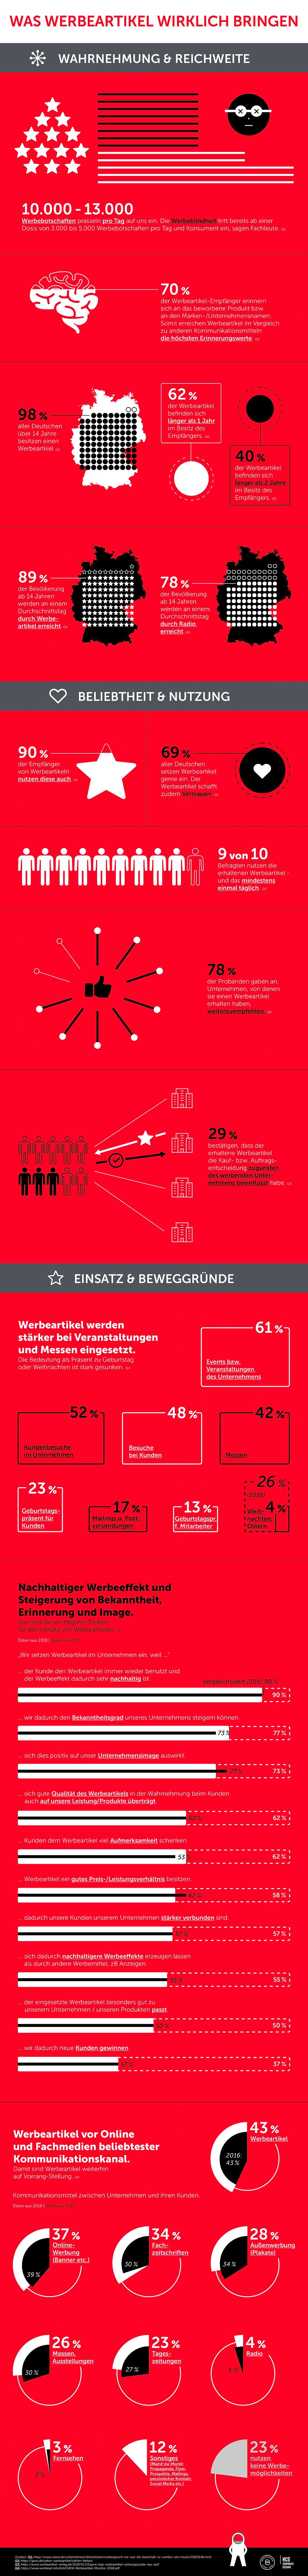 Berendsohn Infografik Design Werbeartikel